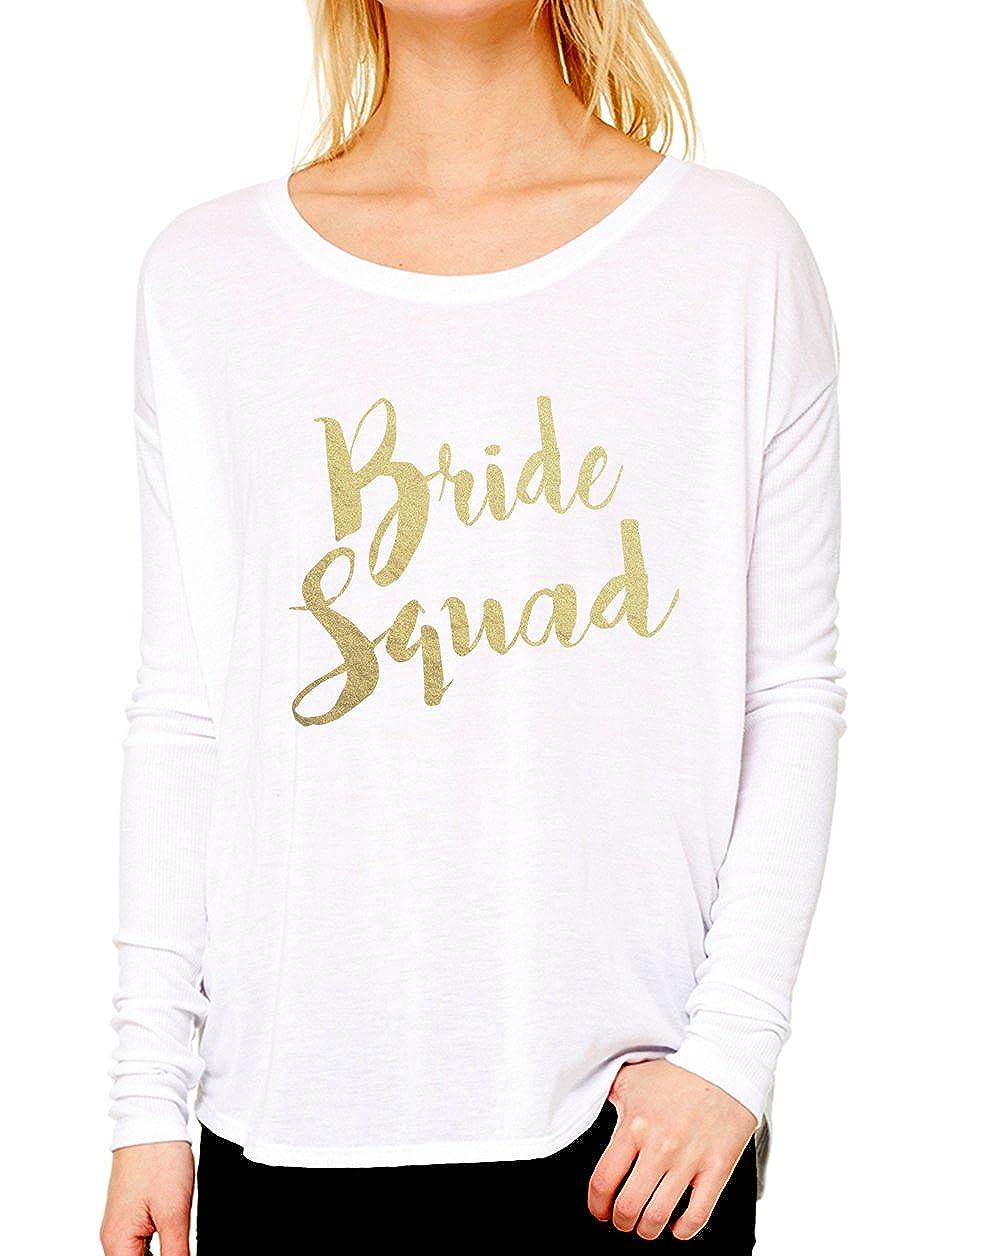 White Emdem Apparel Bride Squad Bridal Shower Long Sleeve Womens Shirt